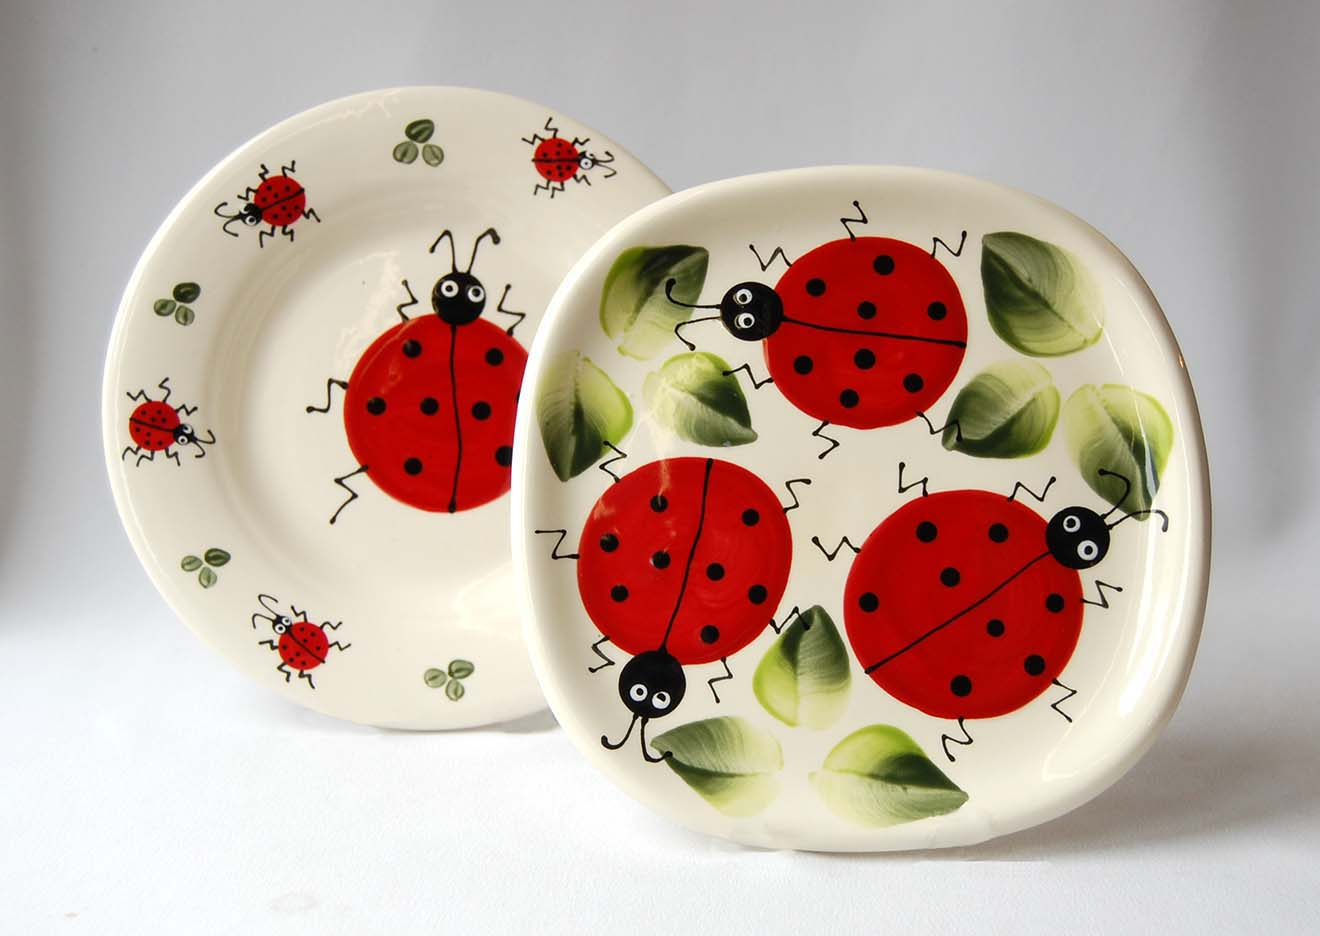 Ladybug ladybird lady bug plates Nova Scotia Jennifer's of Nova Scotia summer